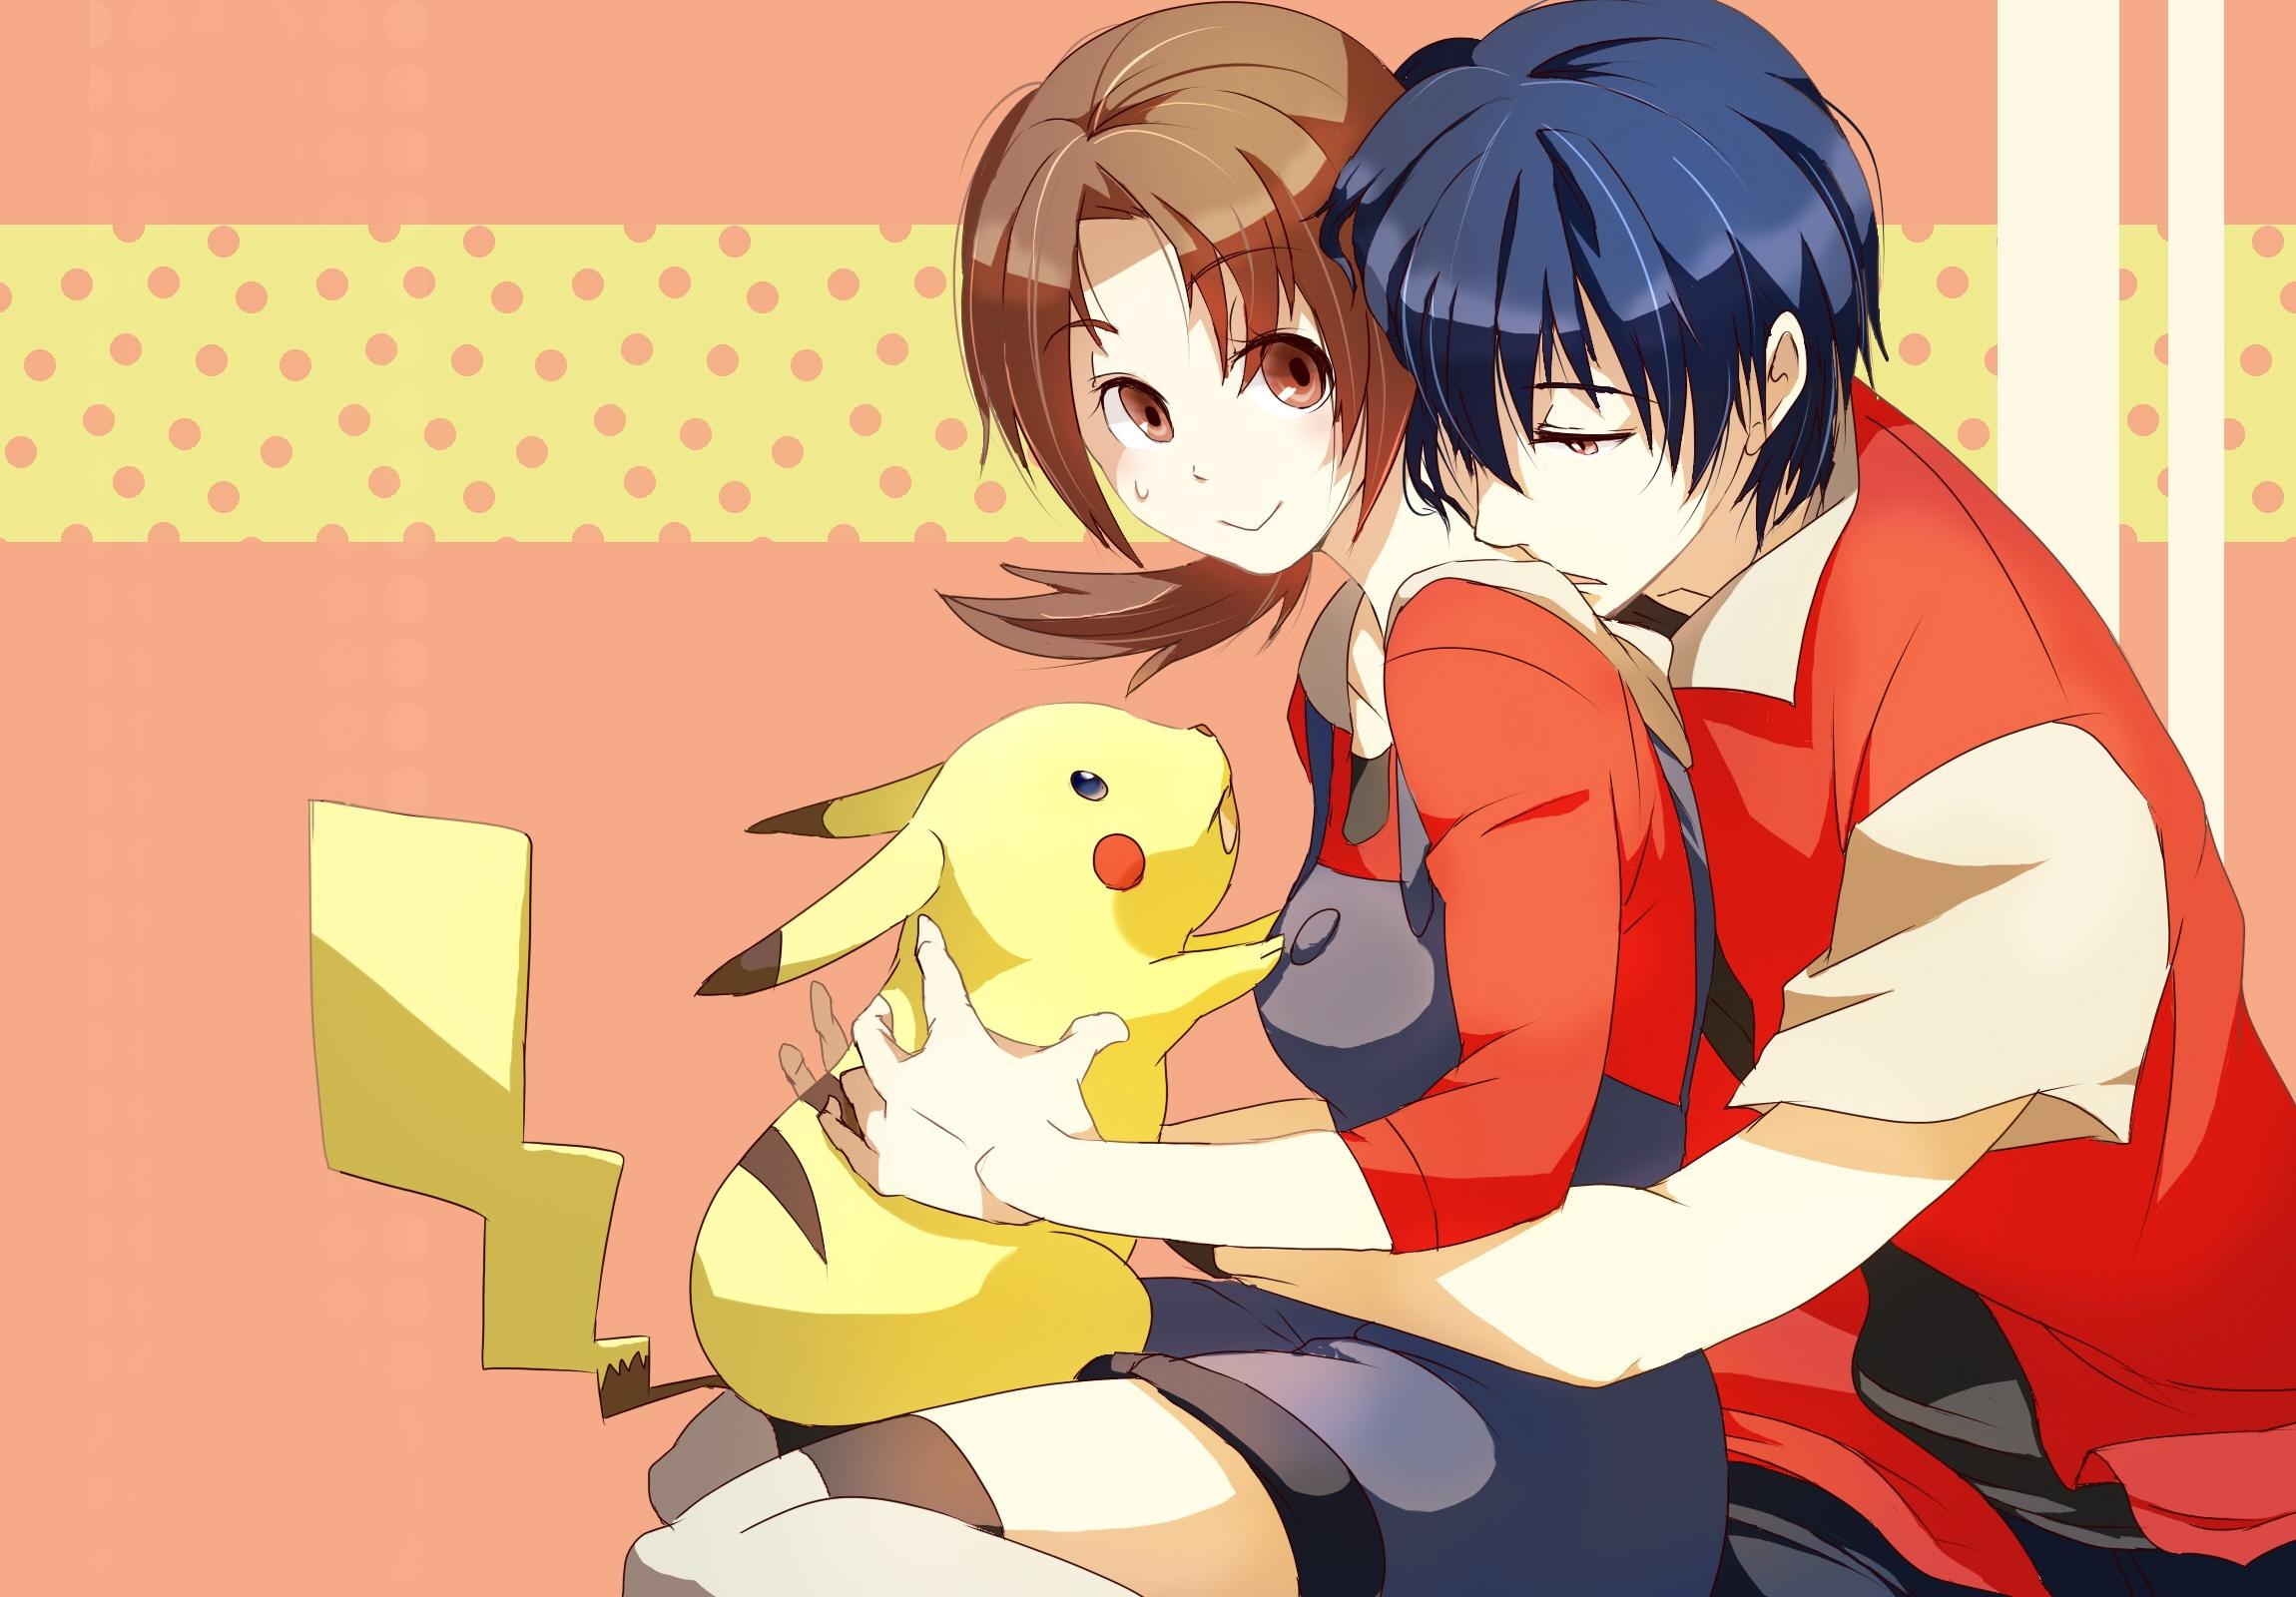 anime manga boy and girl: วอลเปเปอร์ : ภาพประกอบ, อะนิเมะ, การ์ตูน, สัตว์, เด็กชาย